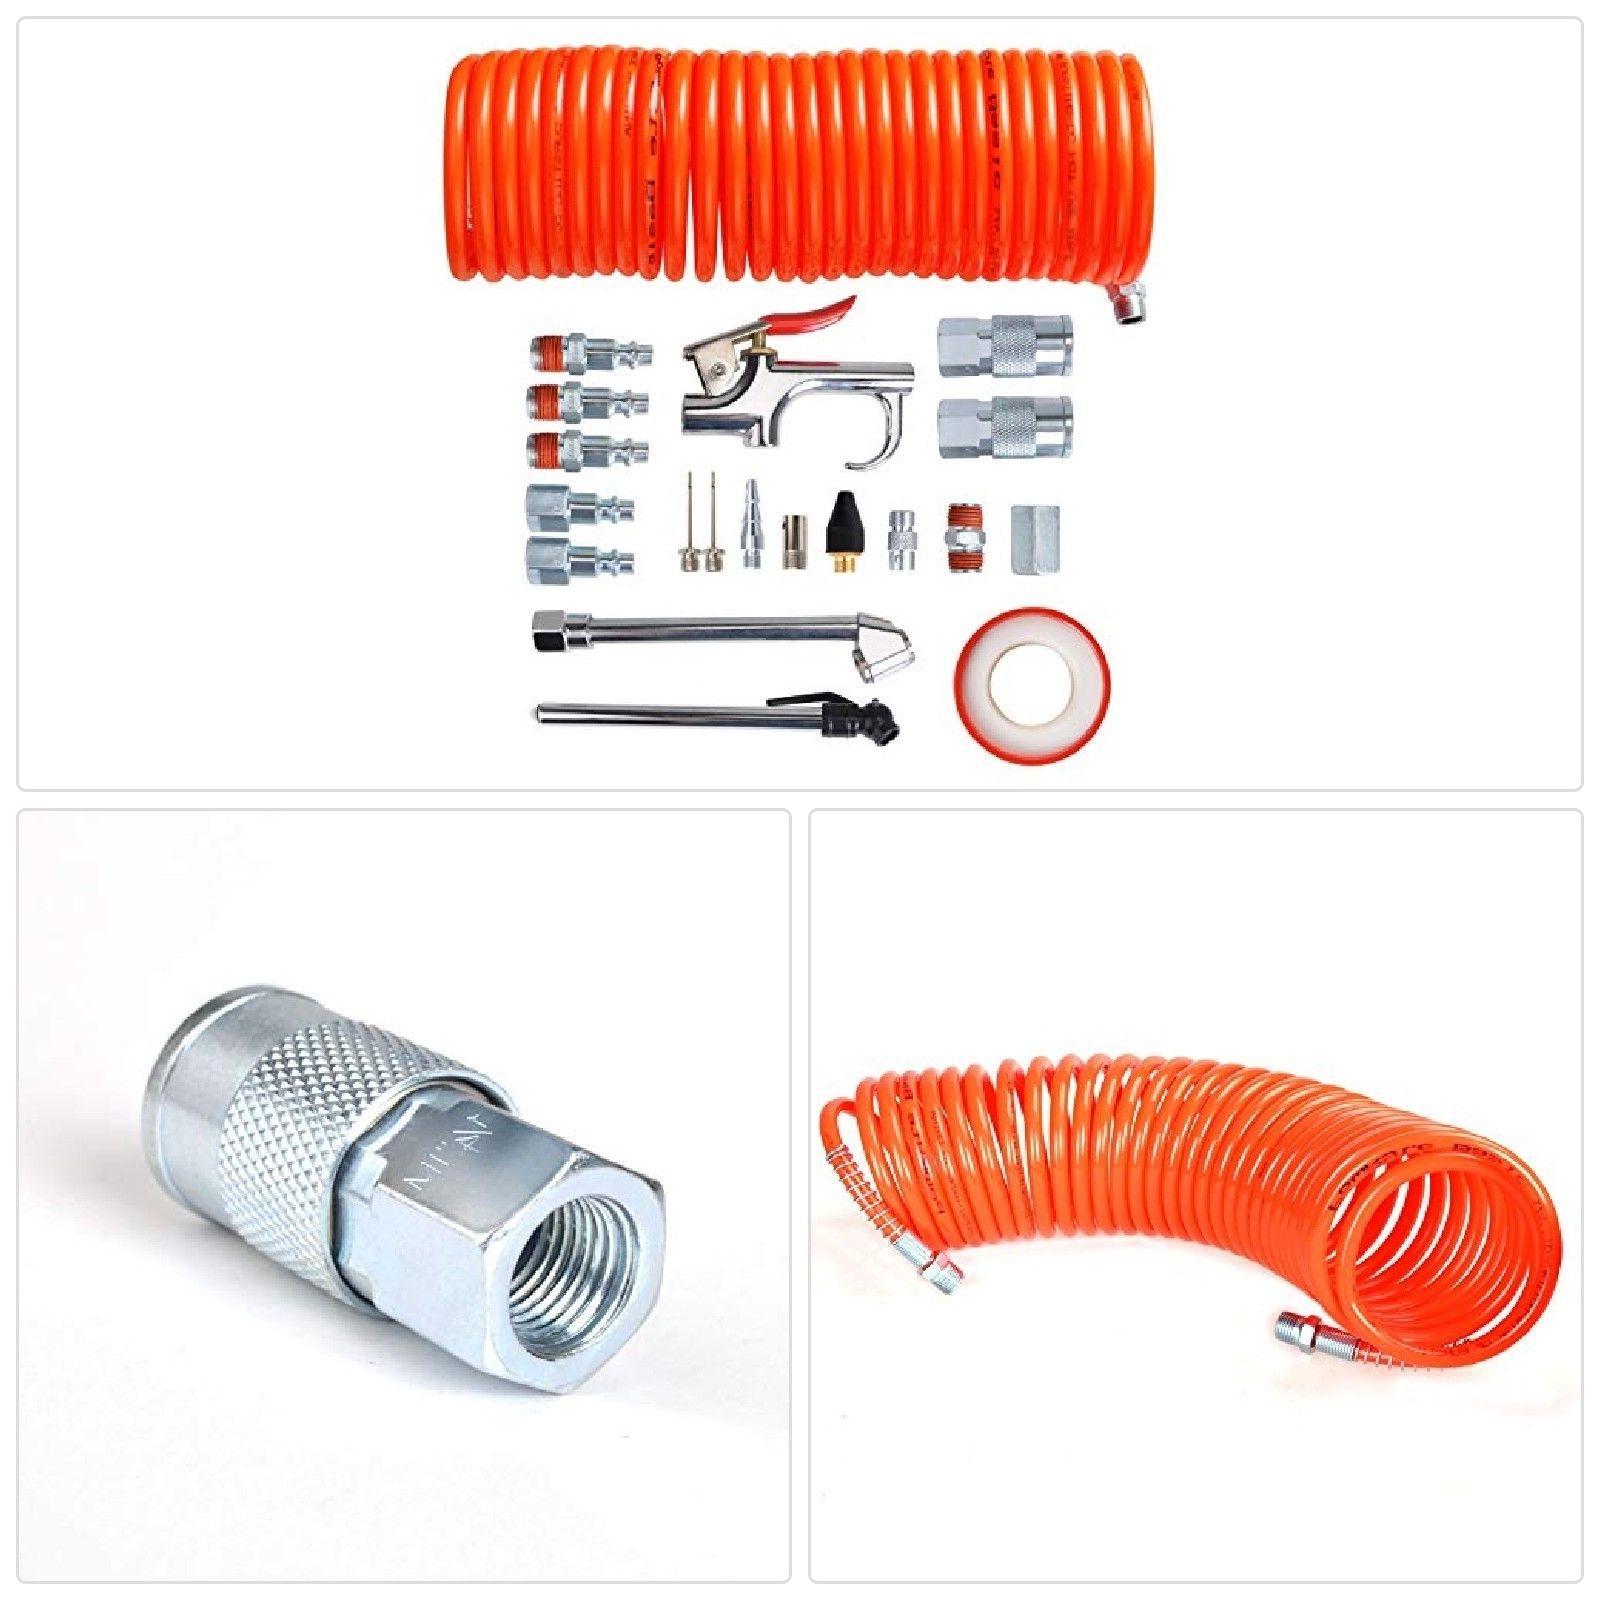 PowRyte 20-Piece Air Compressor Accessory Kit with Blow Gun